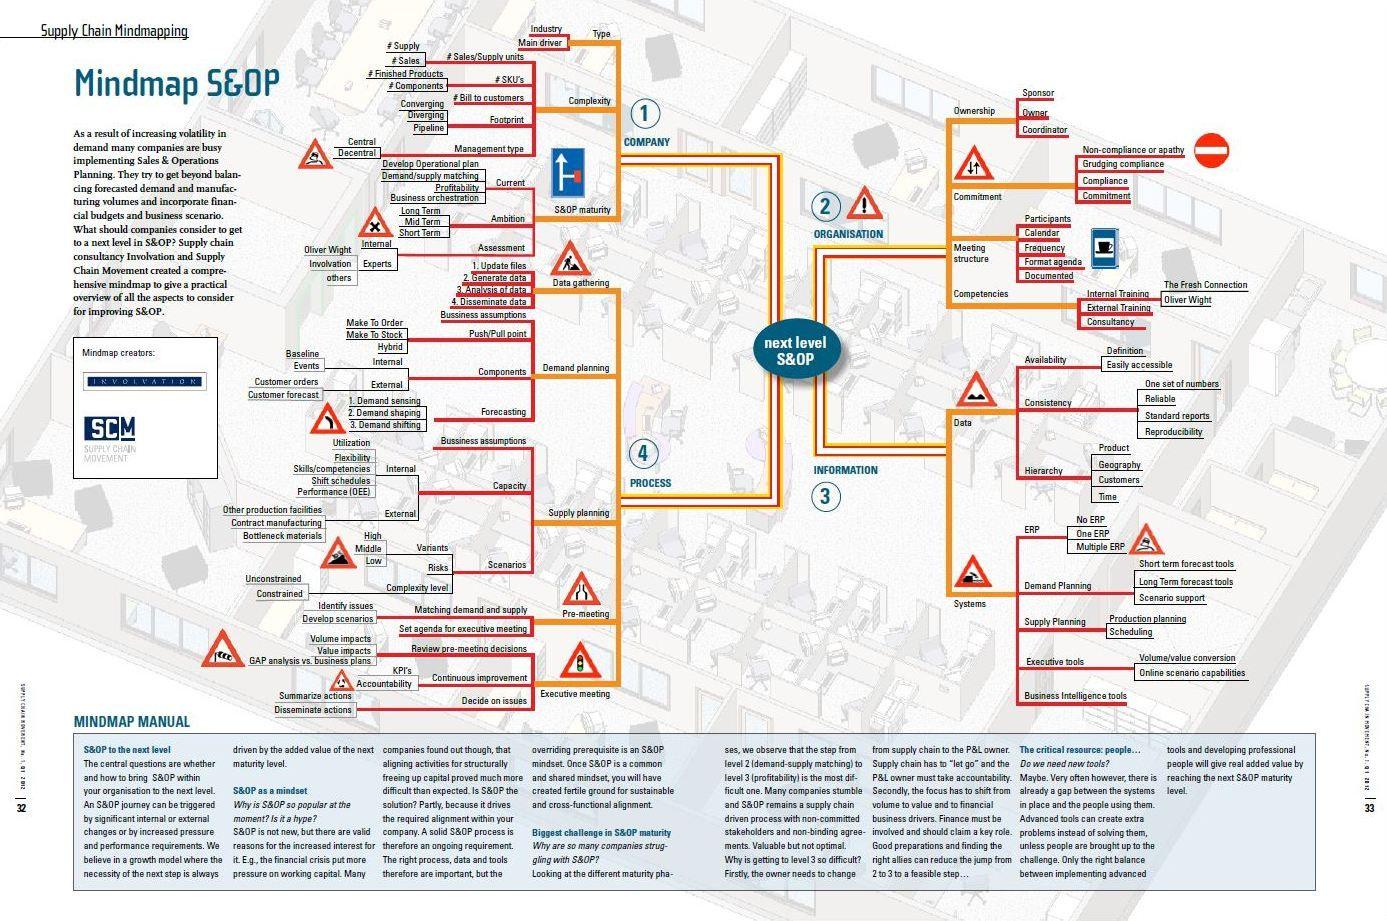 Mindmap sales operations planning 2012 supplychain planning